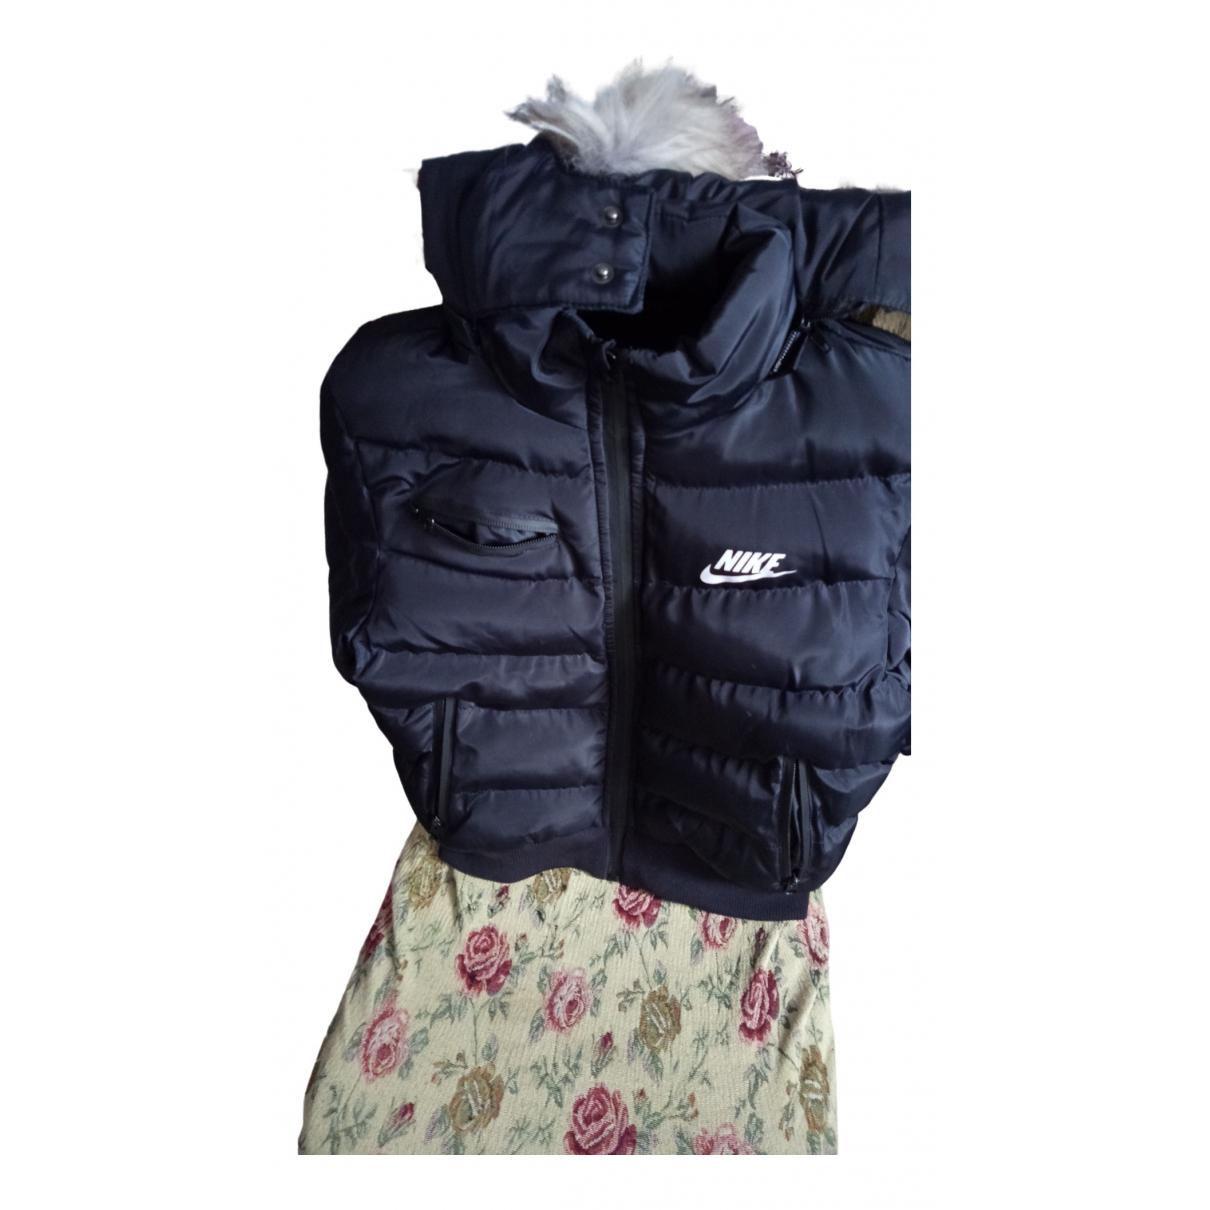 Nike \N Black jacket & coat for Kids 8 years - up to 128cm FR